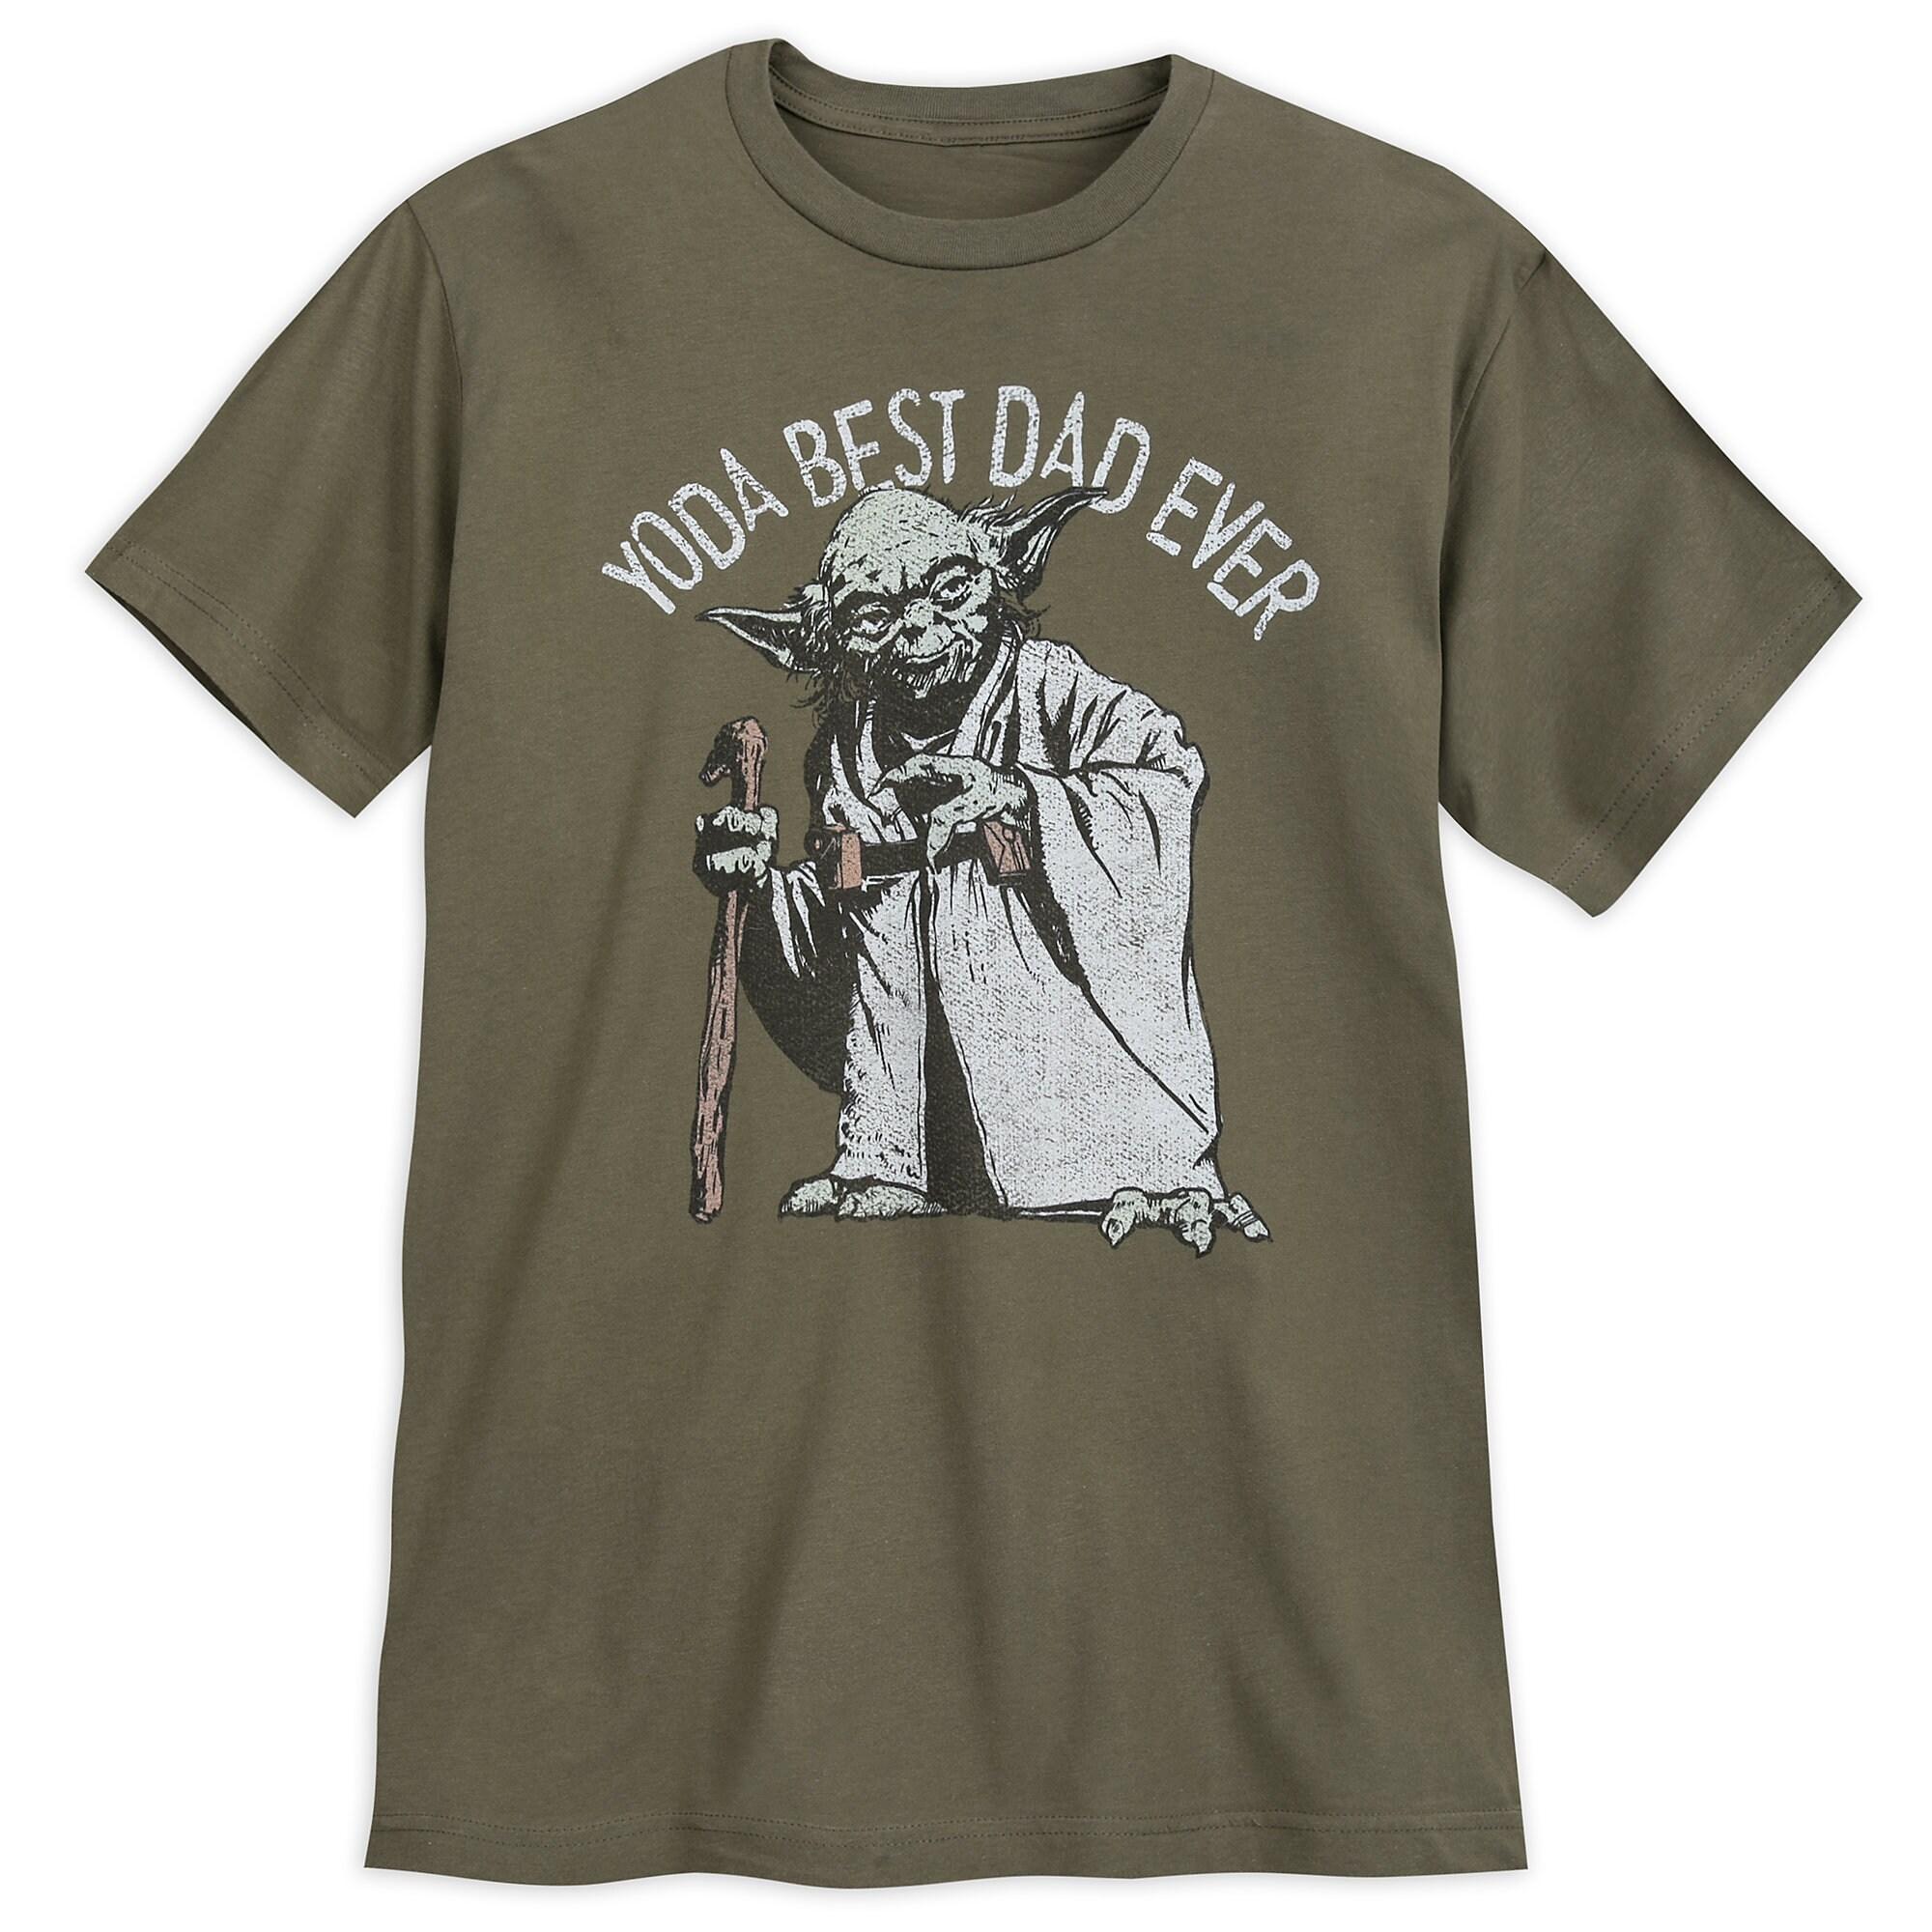 c25bcf130 Yoda ''Best Dad Ever'' T-Shirt for Men - Star Wars   shopDisney